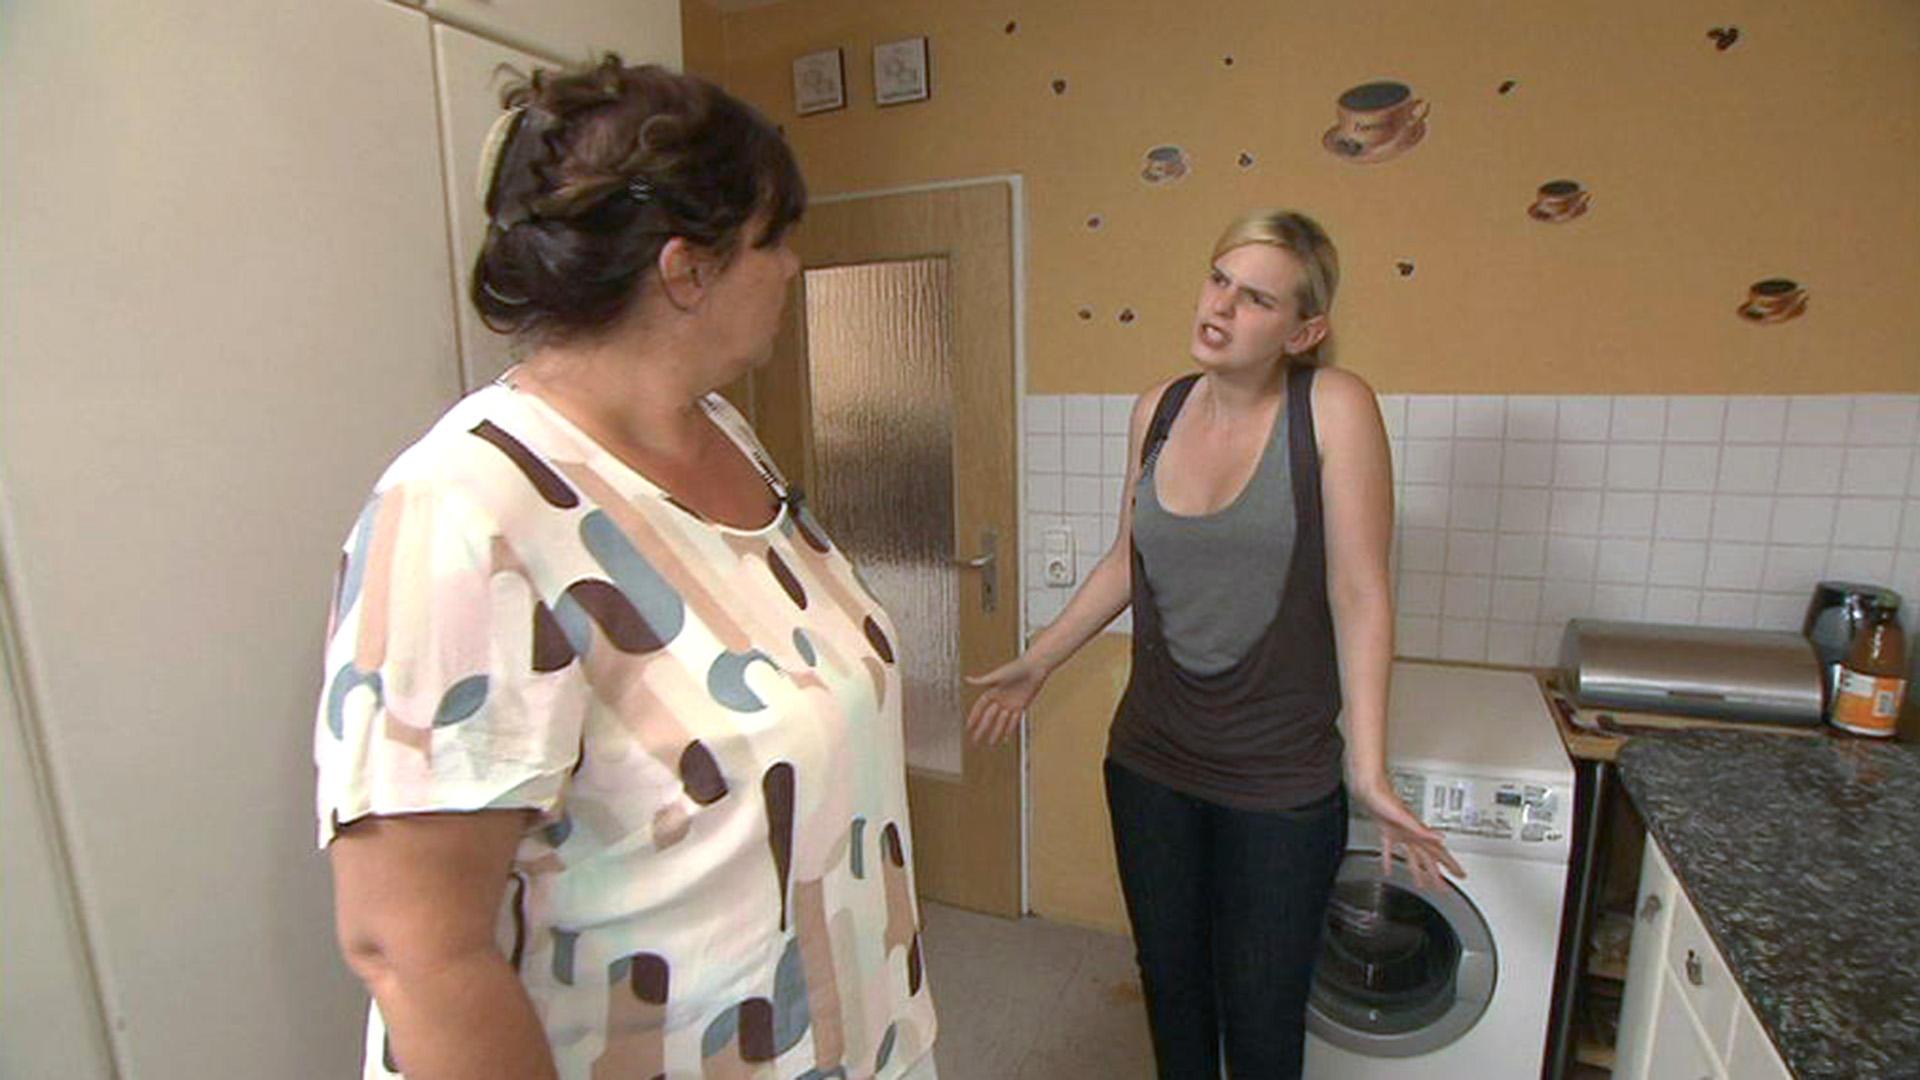 Zwillingsschwangerschaft enttarnt Doppelleben einer 24-Jährigen | Folge 99